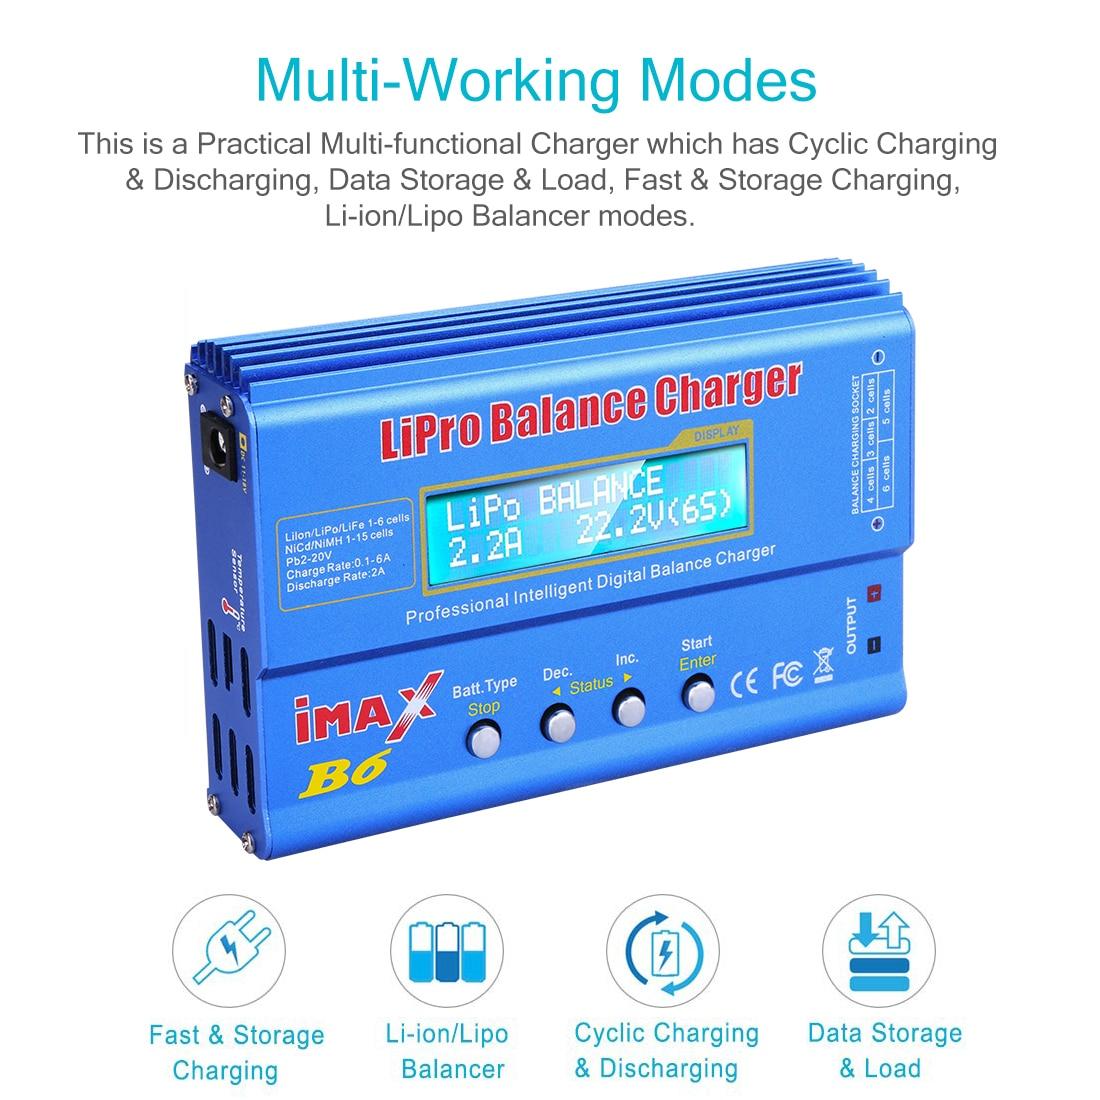 80W Li-Ion Li-Po NiCd Ni-MH Batterie Digital Balance Charger Ladegerät Entlader